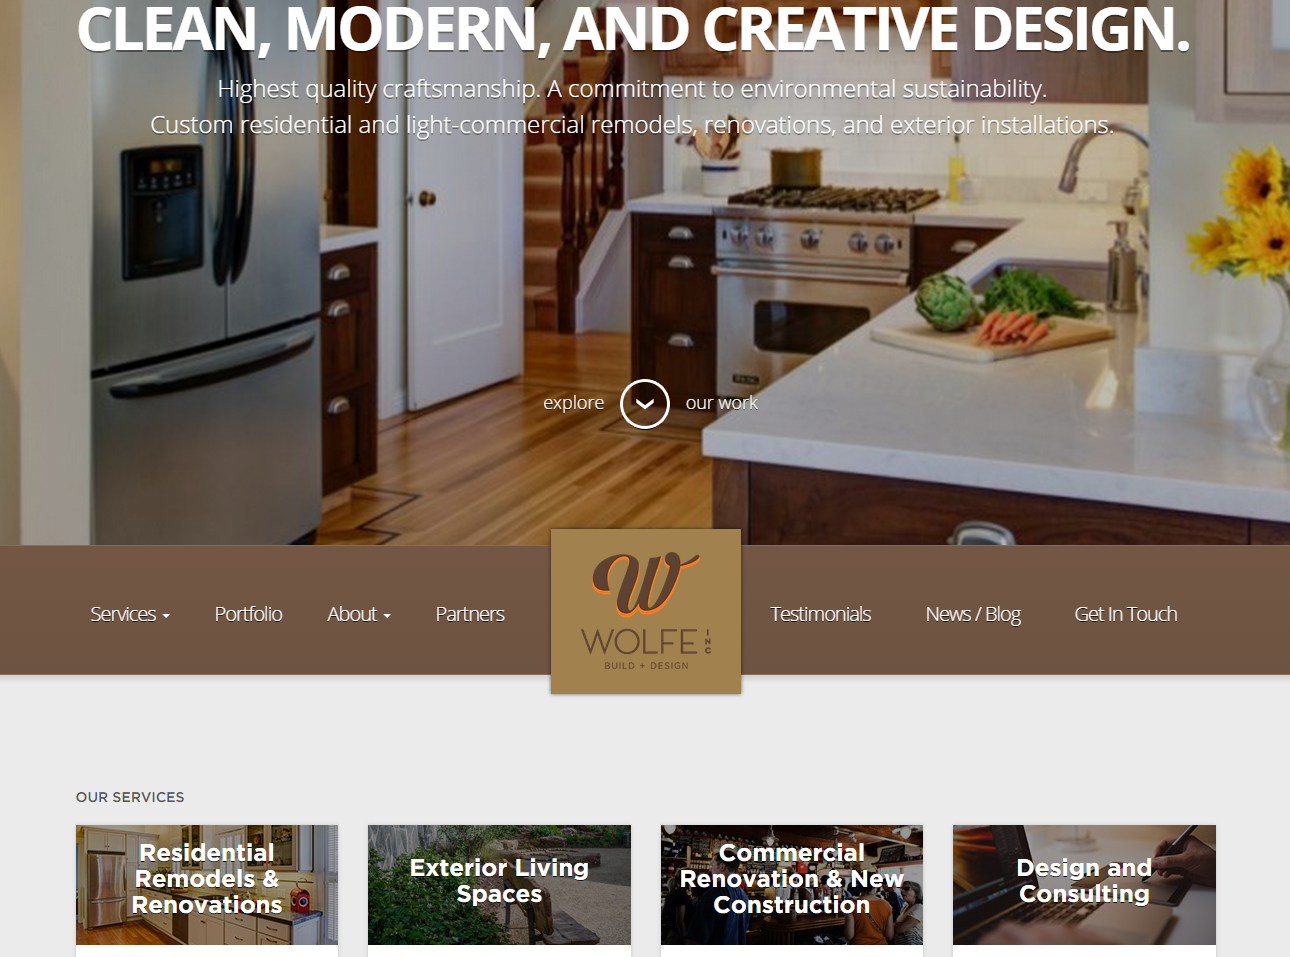 Construction websites bay area, bay area web design, web design oakland